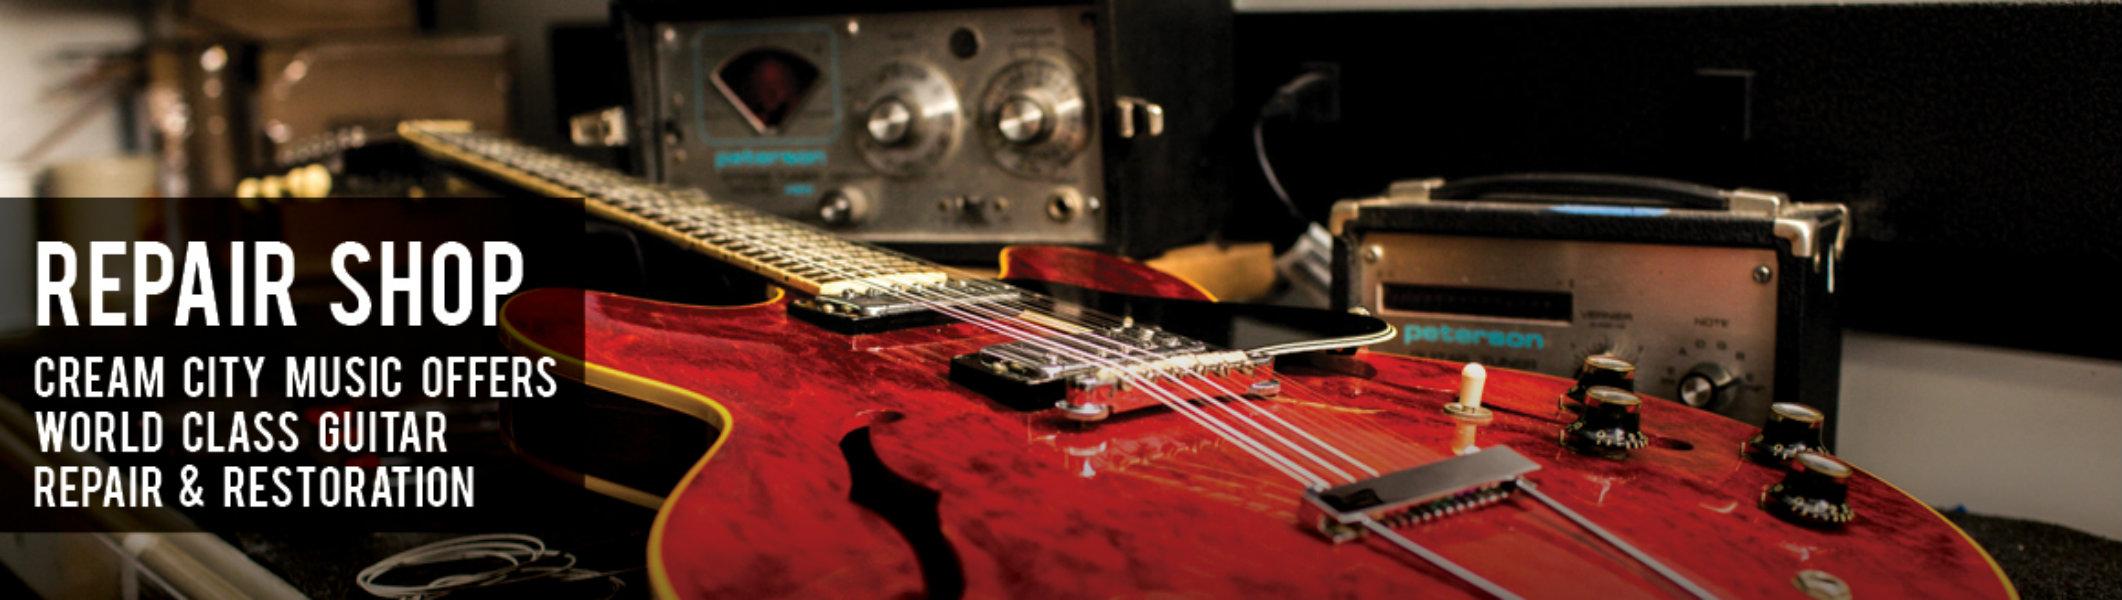 milwaukee guitar repairs cream city music. Black Bedroom Furniture Sets. Home Design Ideas